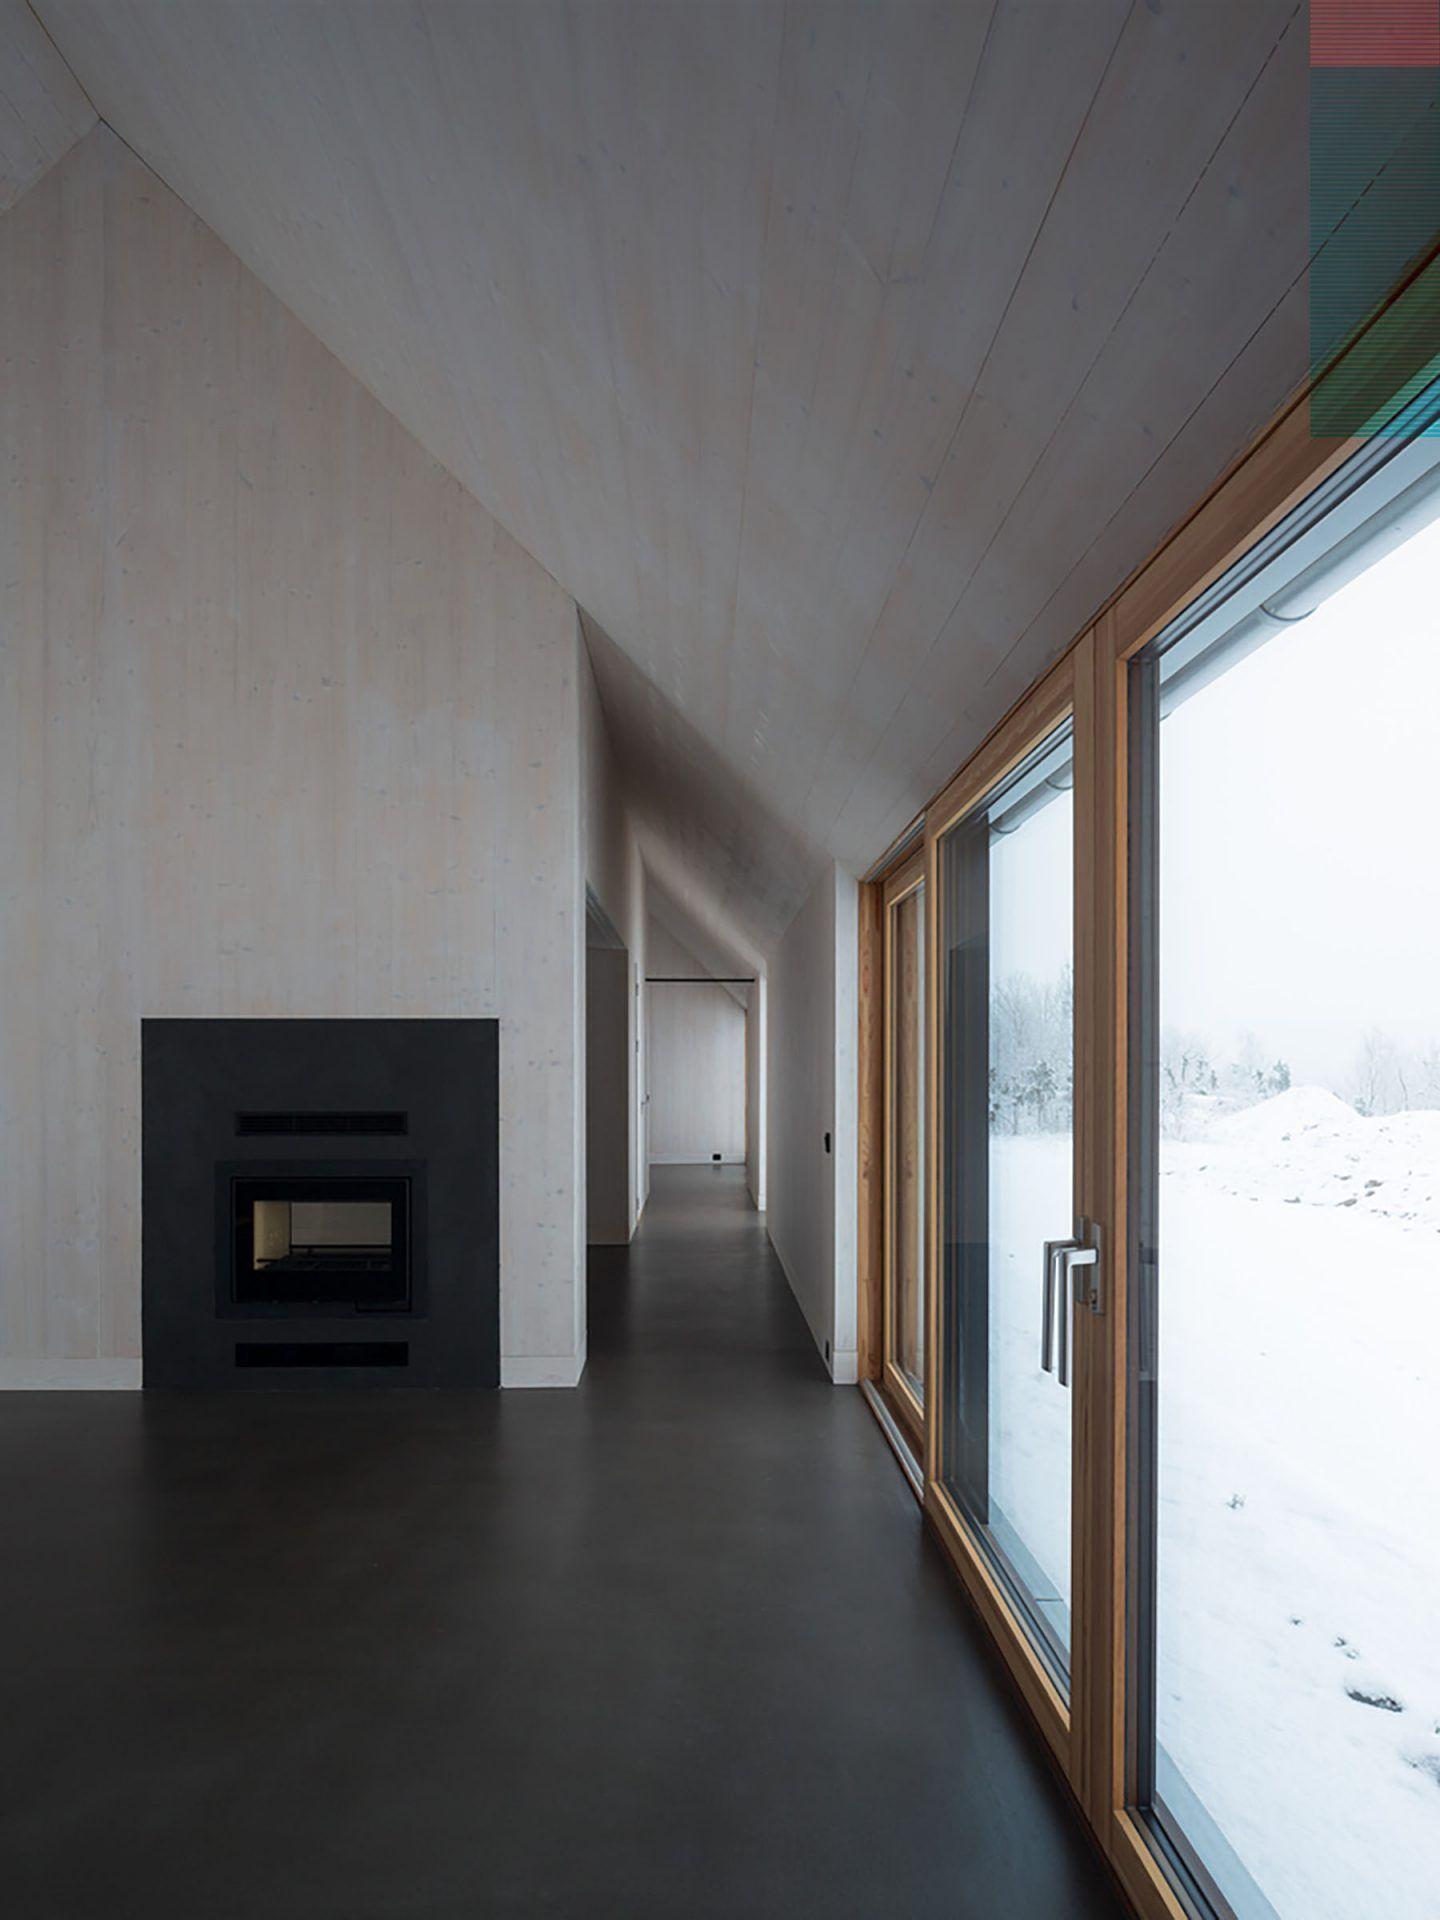 IGNANT-Architecture-Jim-Brunnestom-Dalsland-Cabin-2.0-2